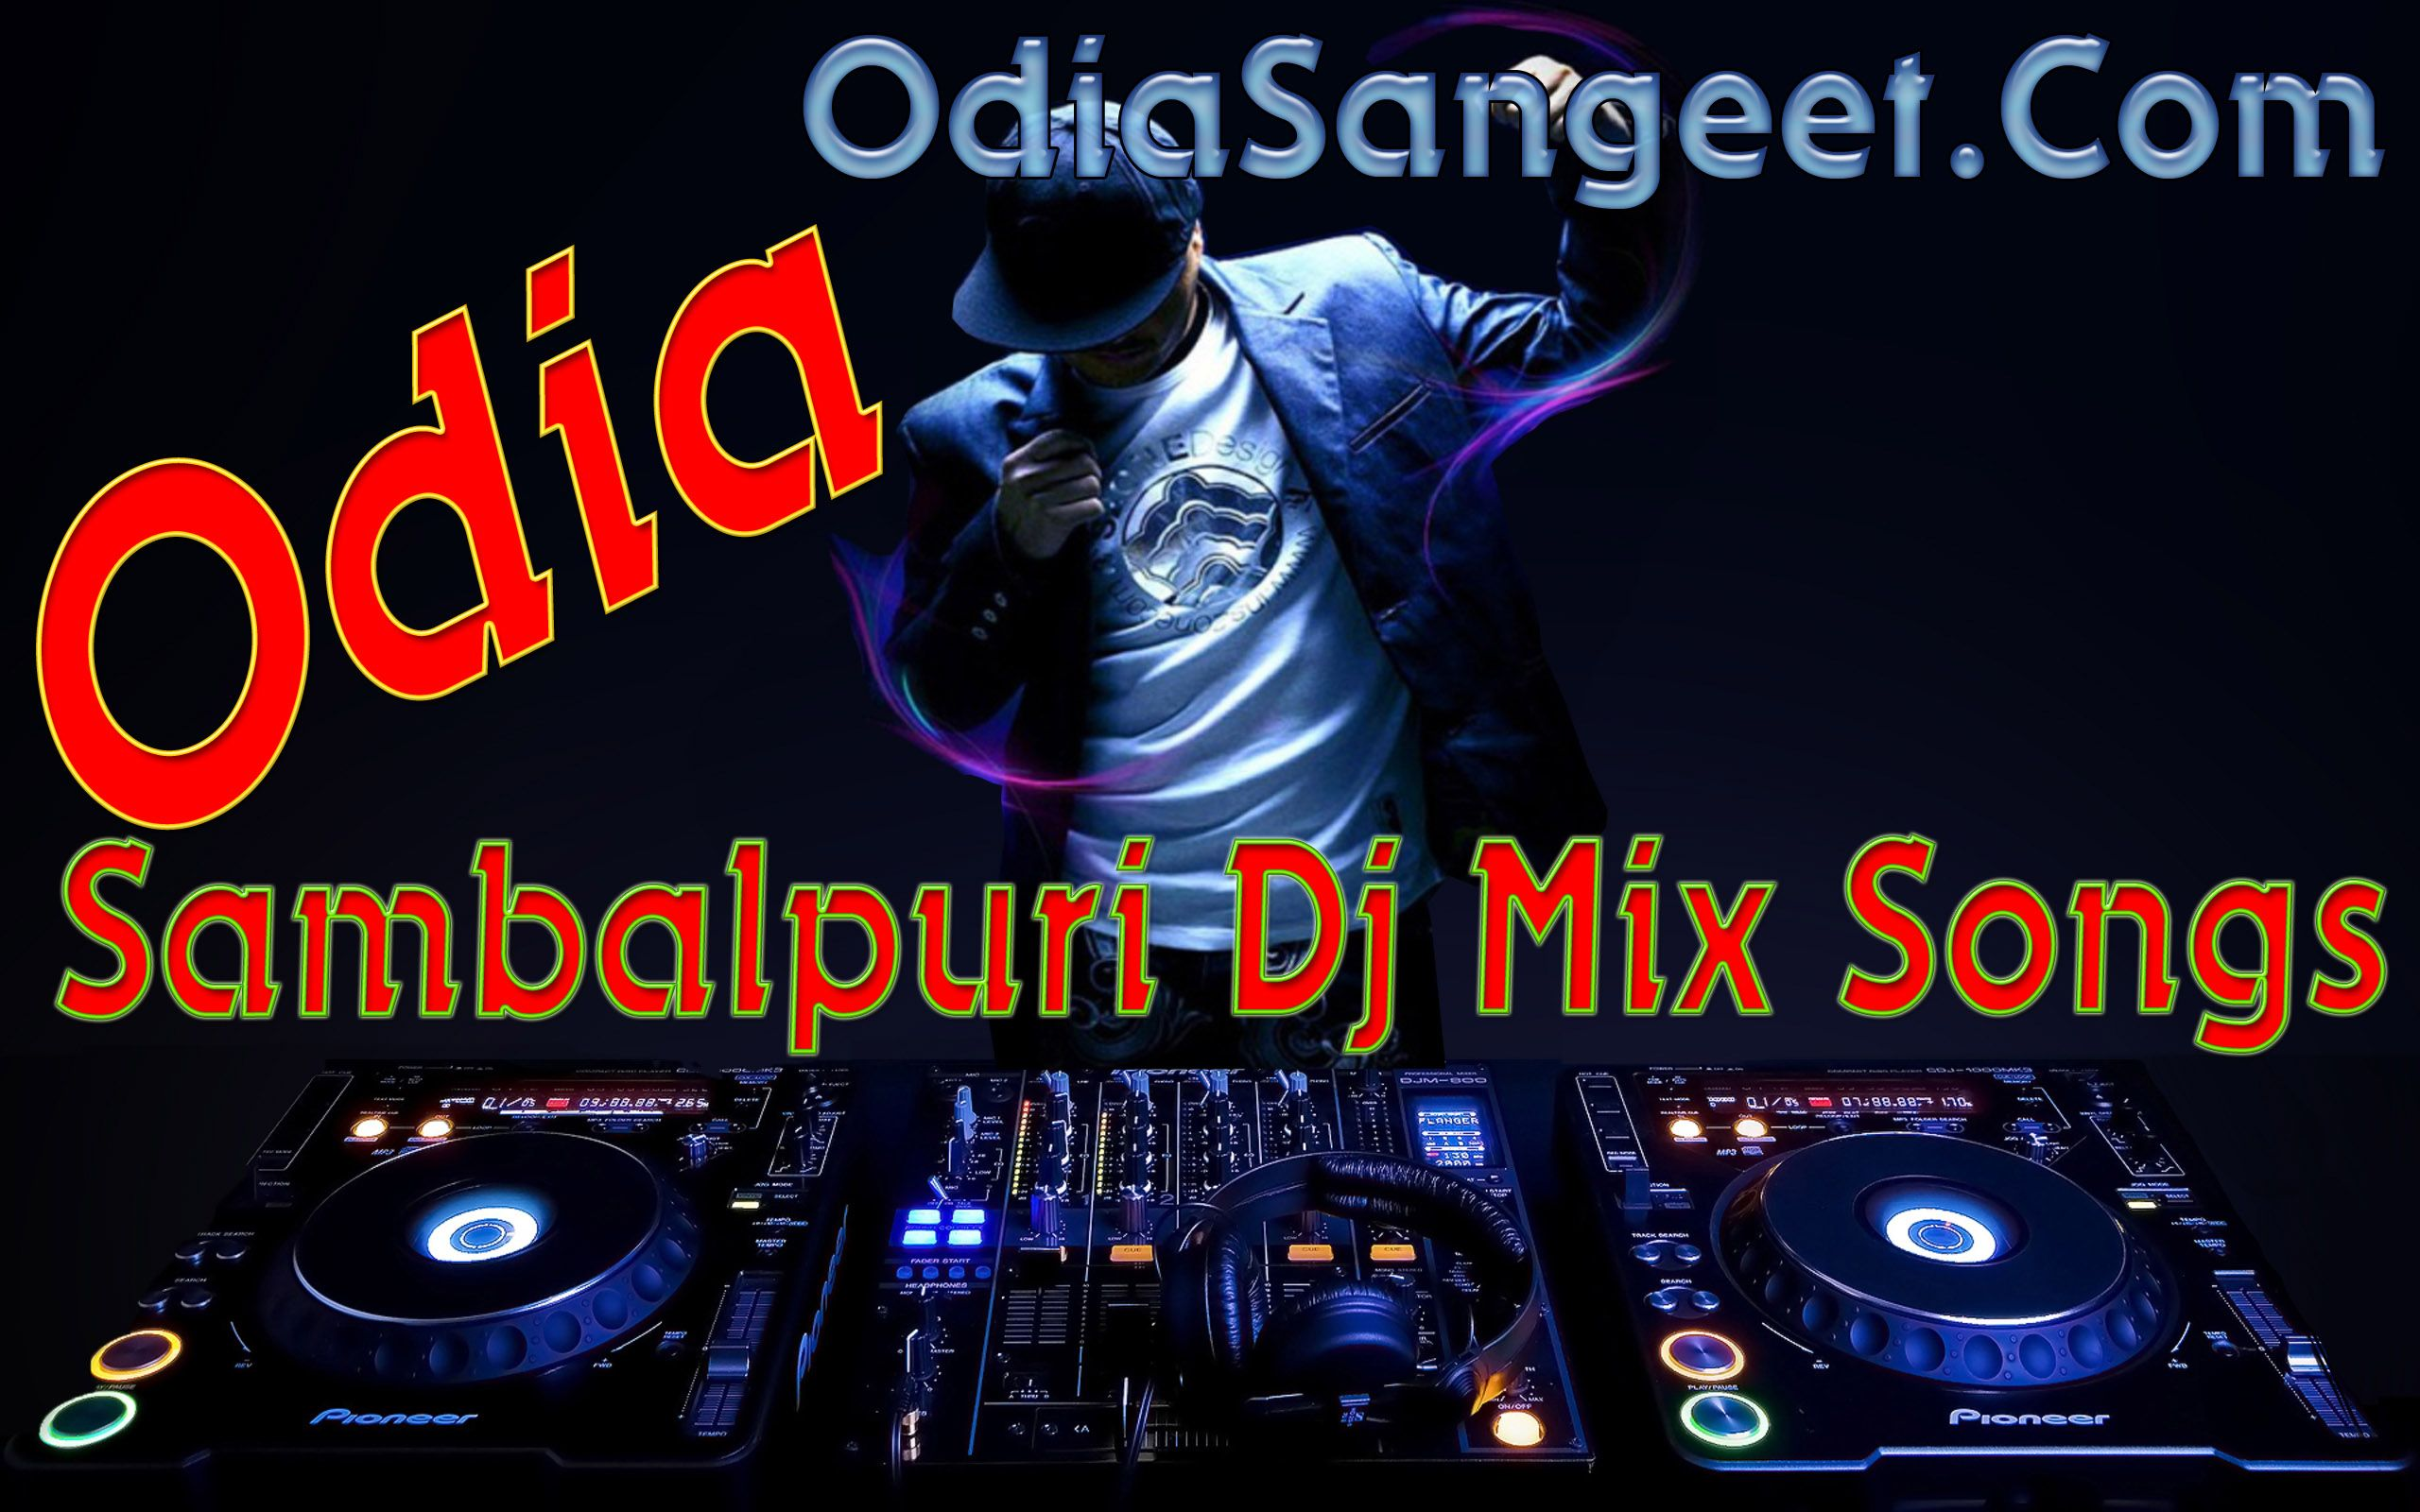 Rela Gadi Chhuku Chhuku Tapori Remix Dj Raju Exclusive Mp3 Sambalpuri Dj Mix Songs Download For Free Mp3 Song Dj Mp3 Songs